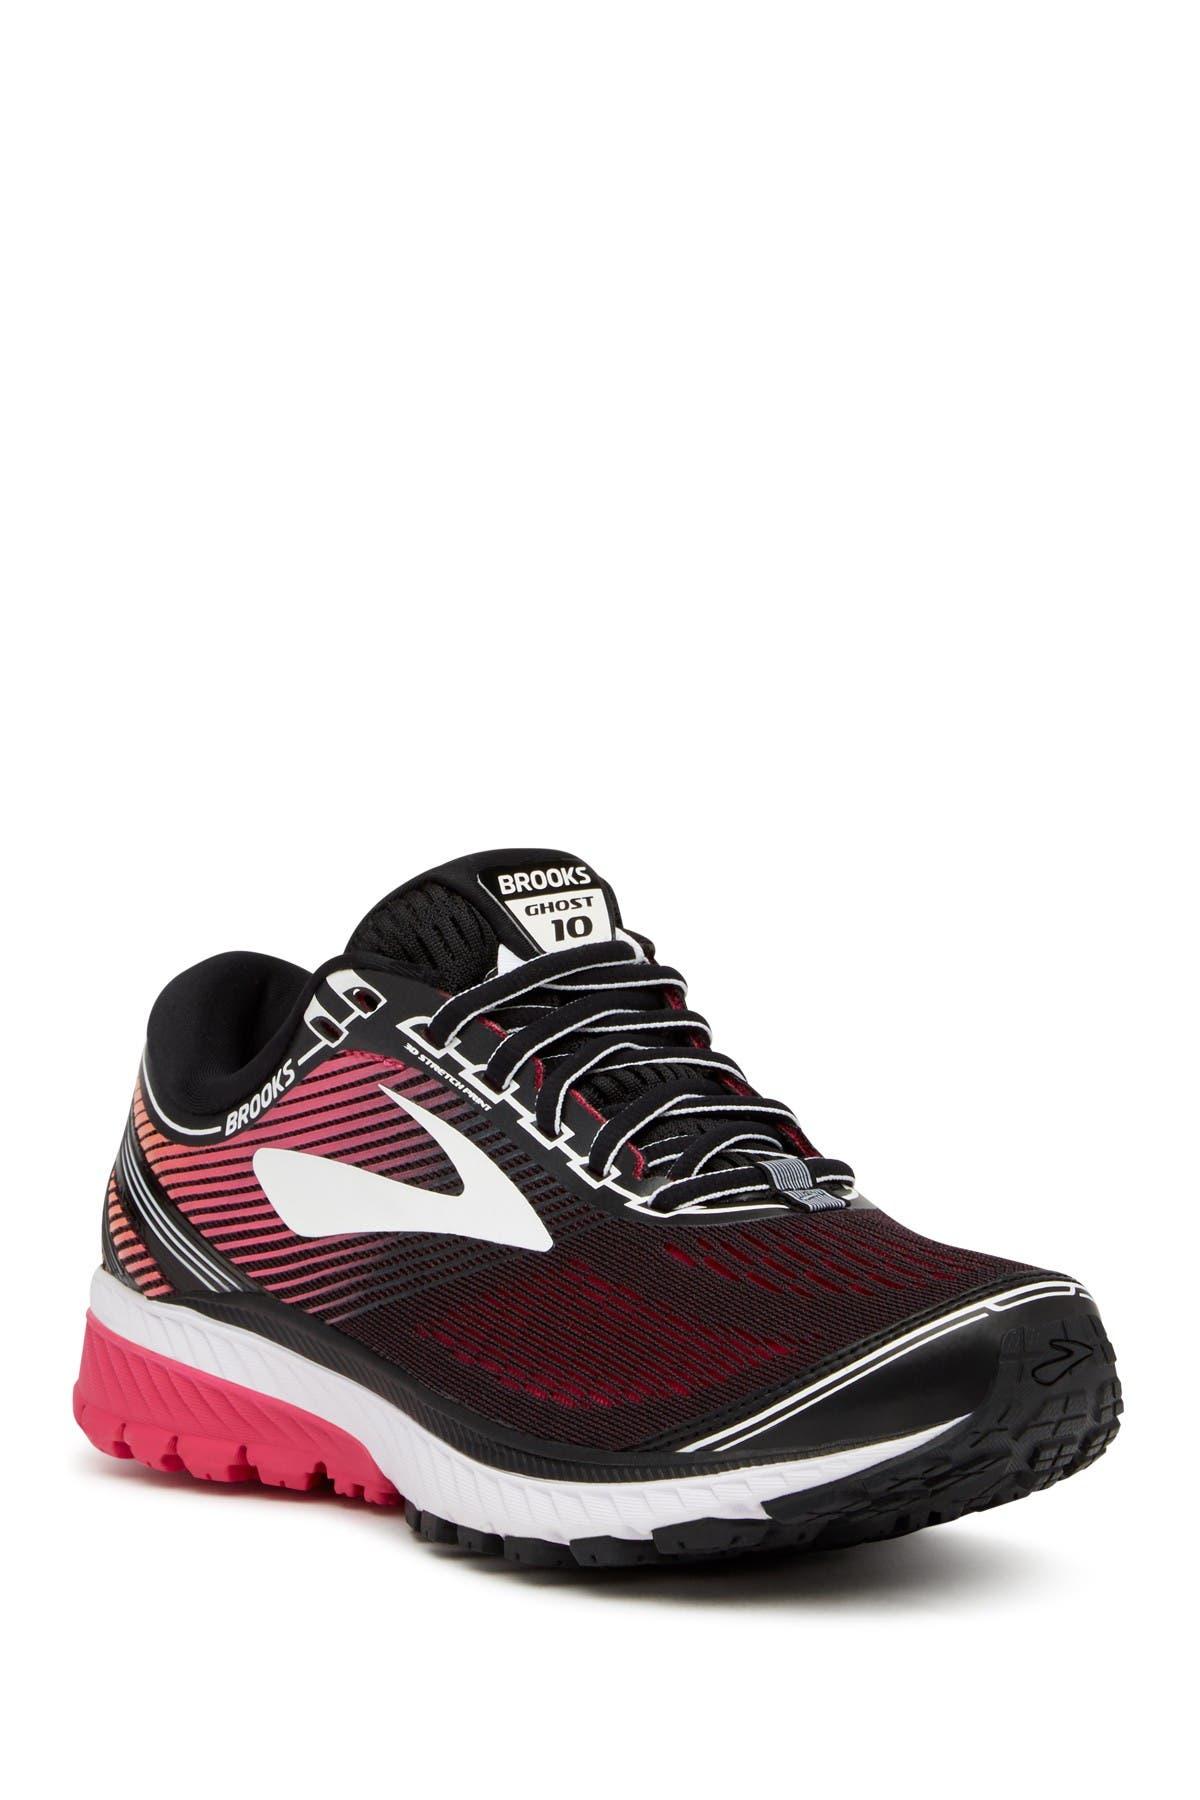 Brooks | Ghost 10 Running Shoe